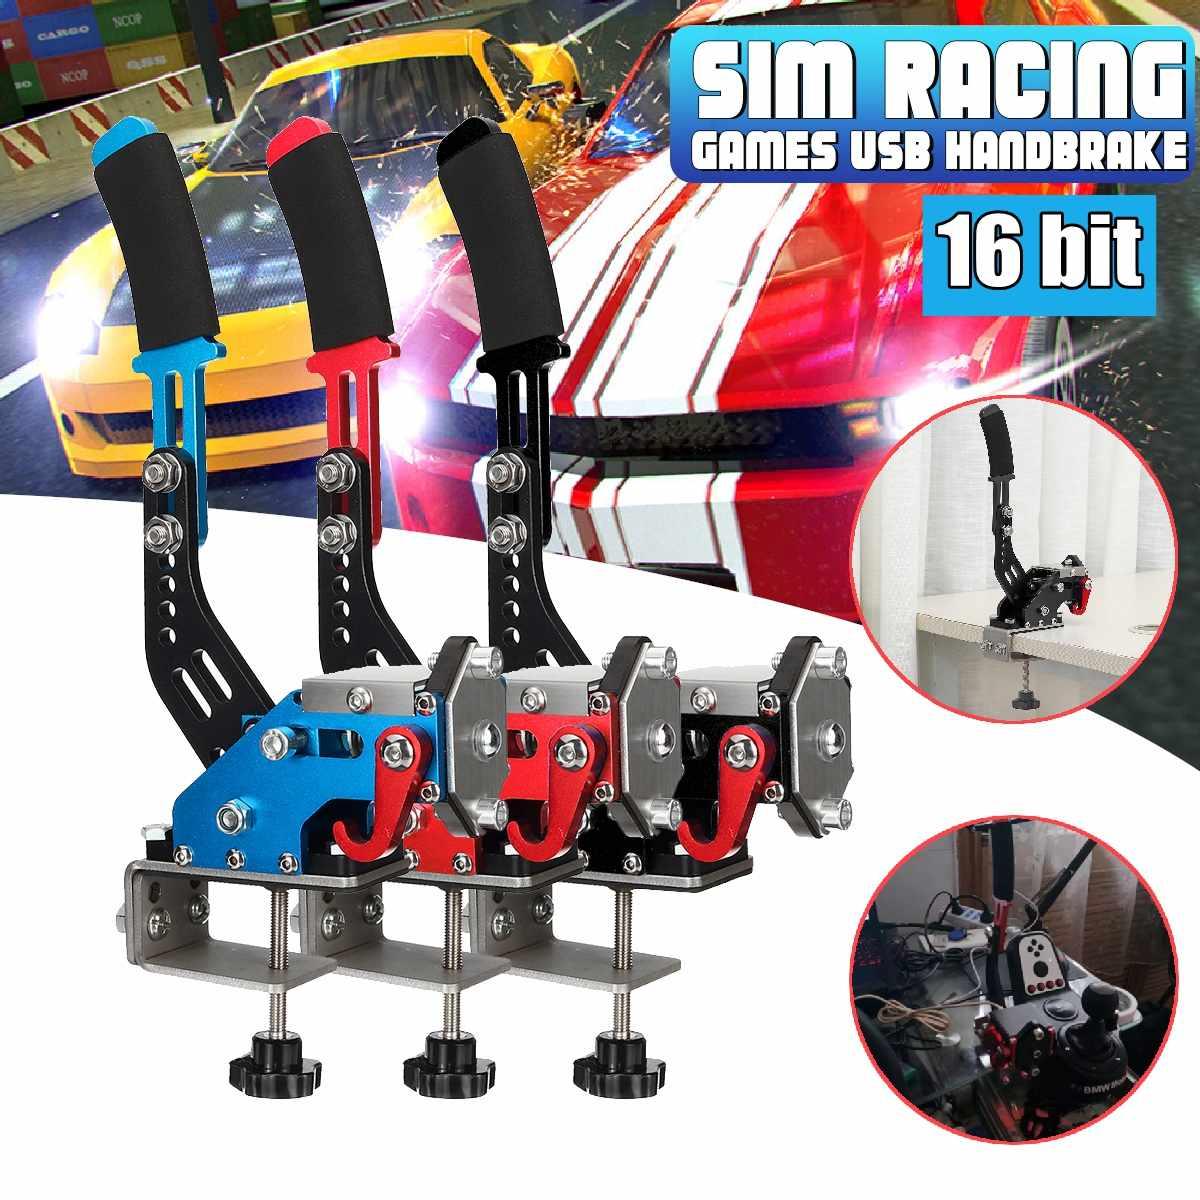 Upgrade 16bit Hall Sensor USB Handbrake SIM W/Clamp For Racing Games G25/27/29 T500 FANATECOSW DIRT RA LLY